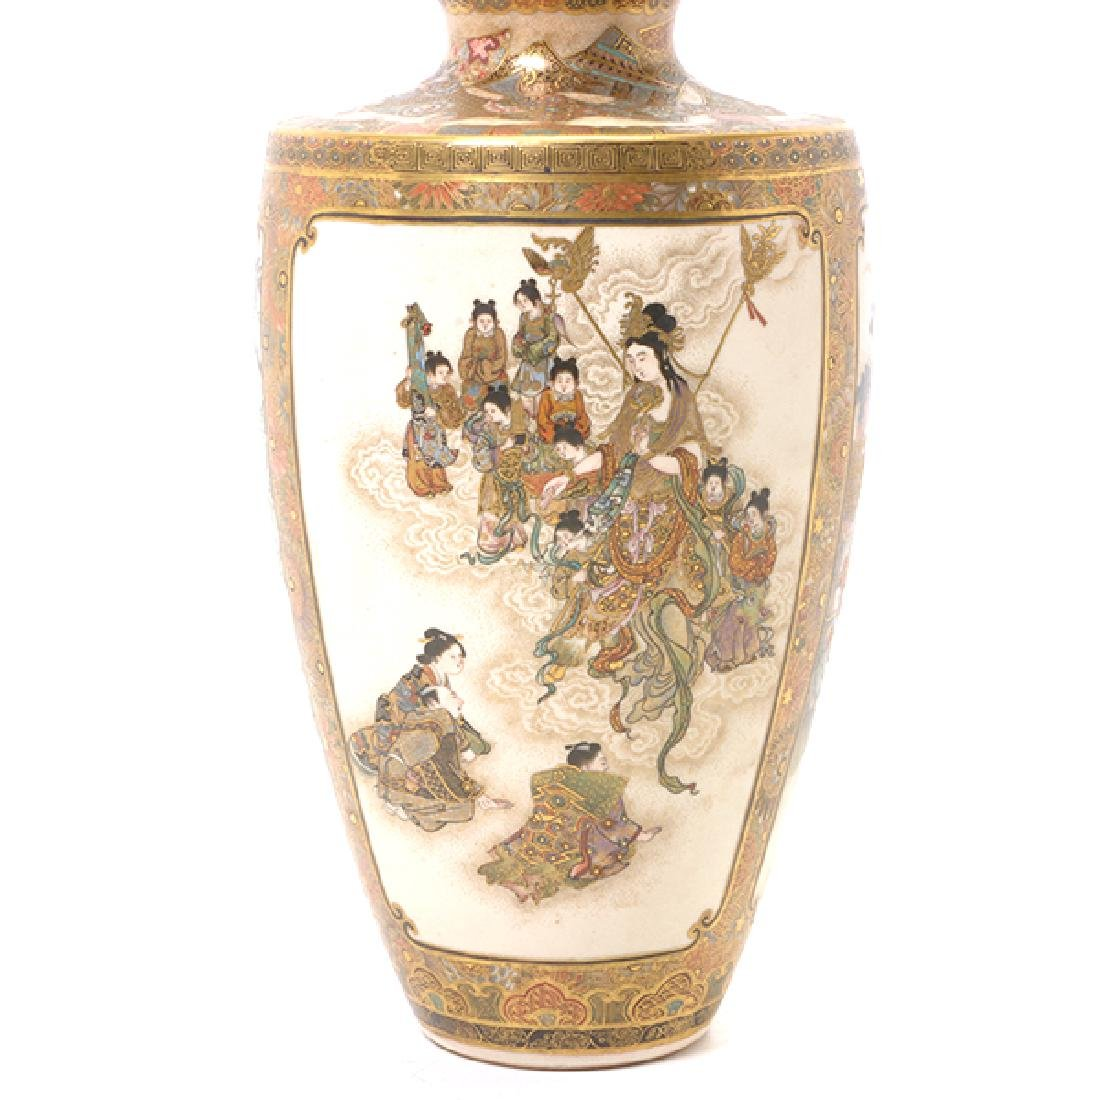 A Pair of Satsuma Vases By Okamoto Ryozan, Meiji Period - 3